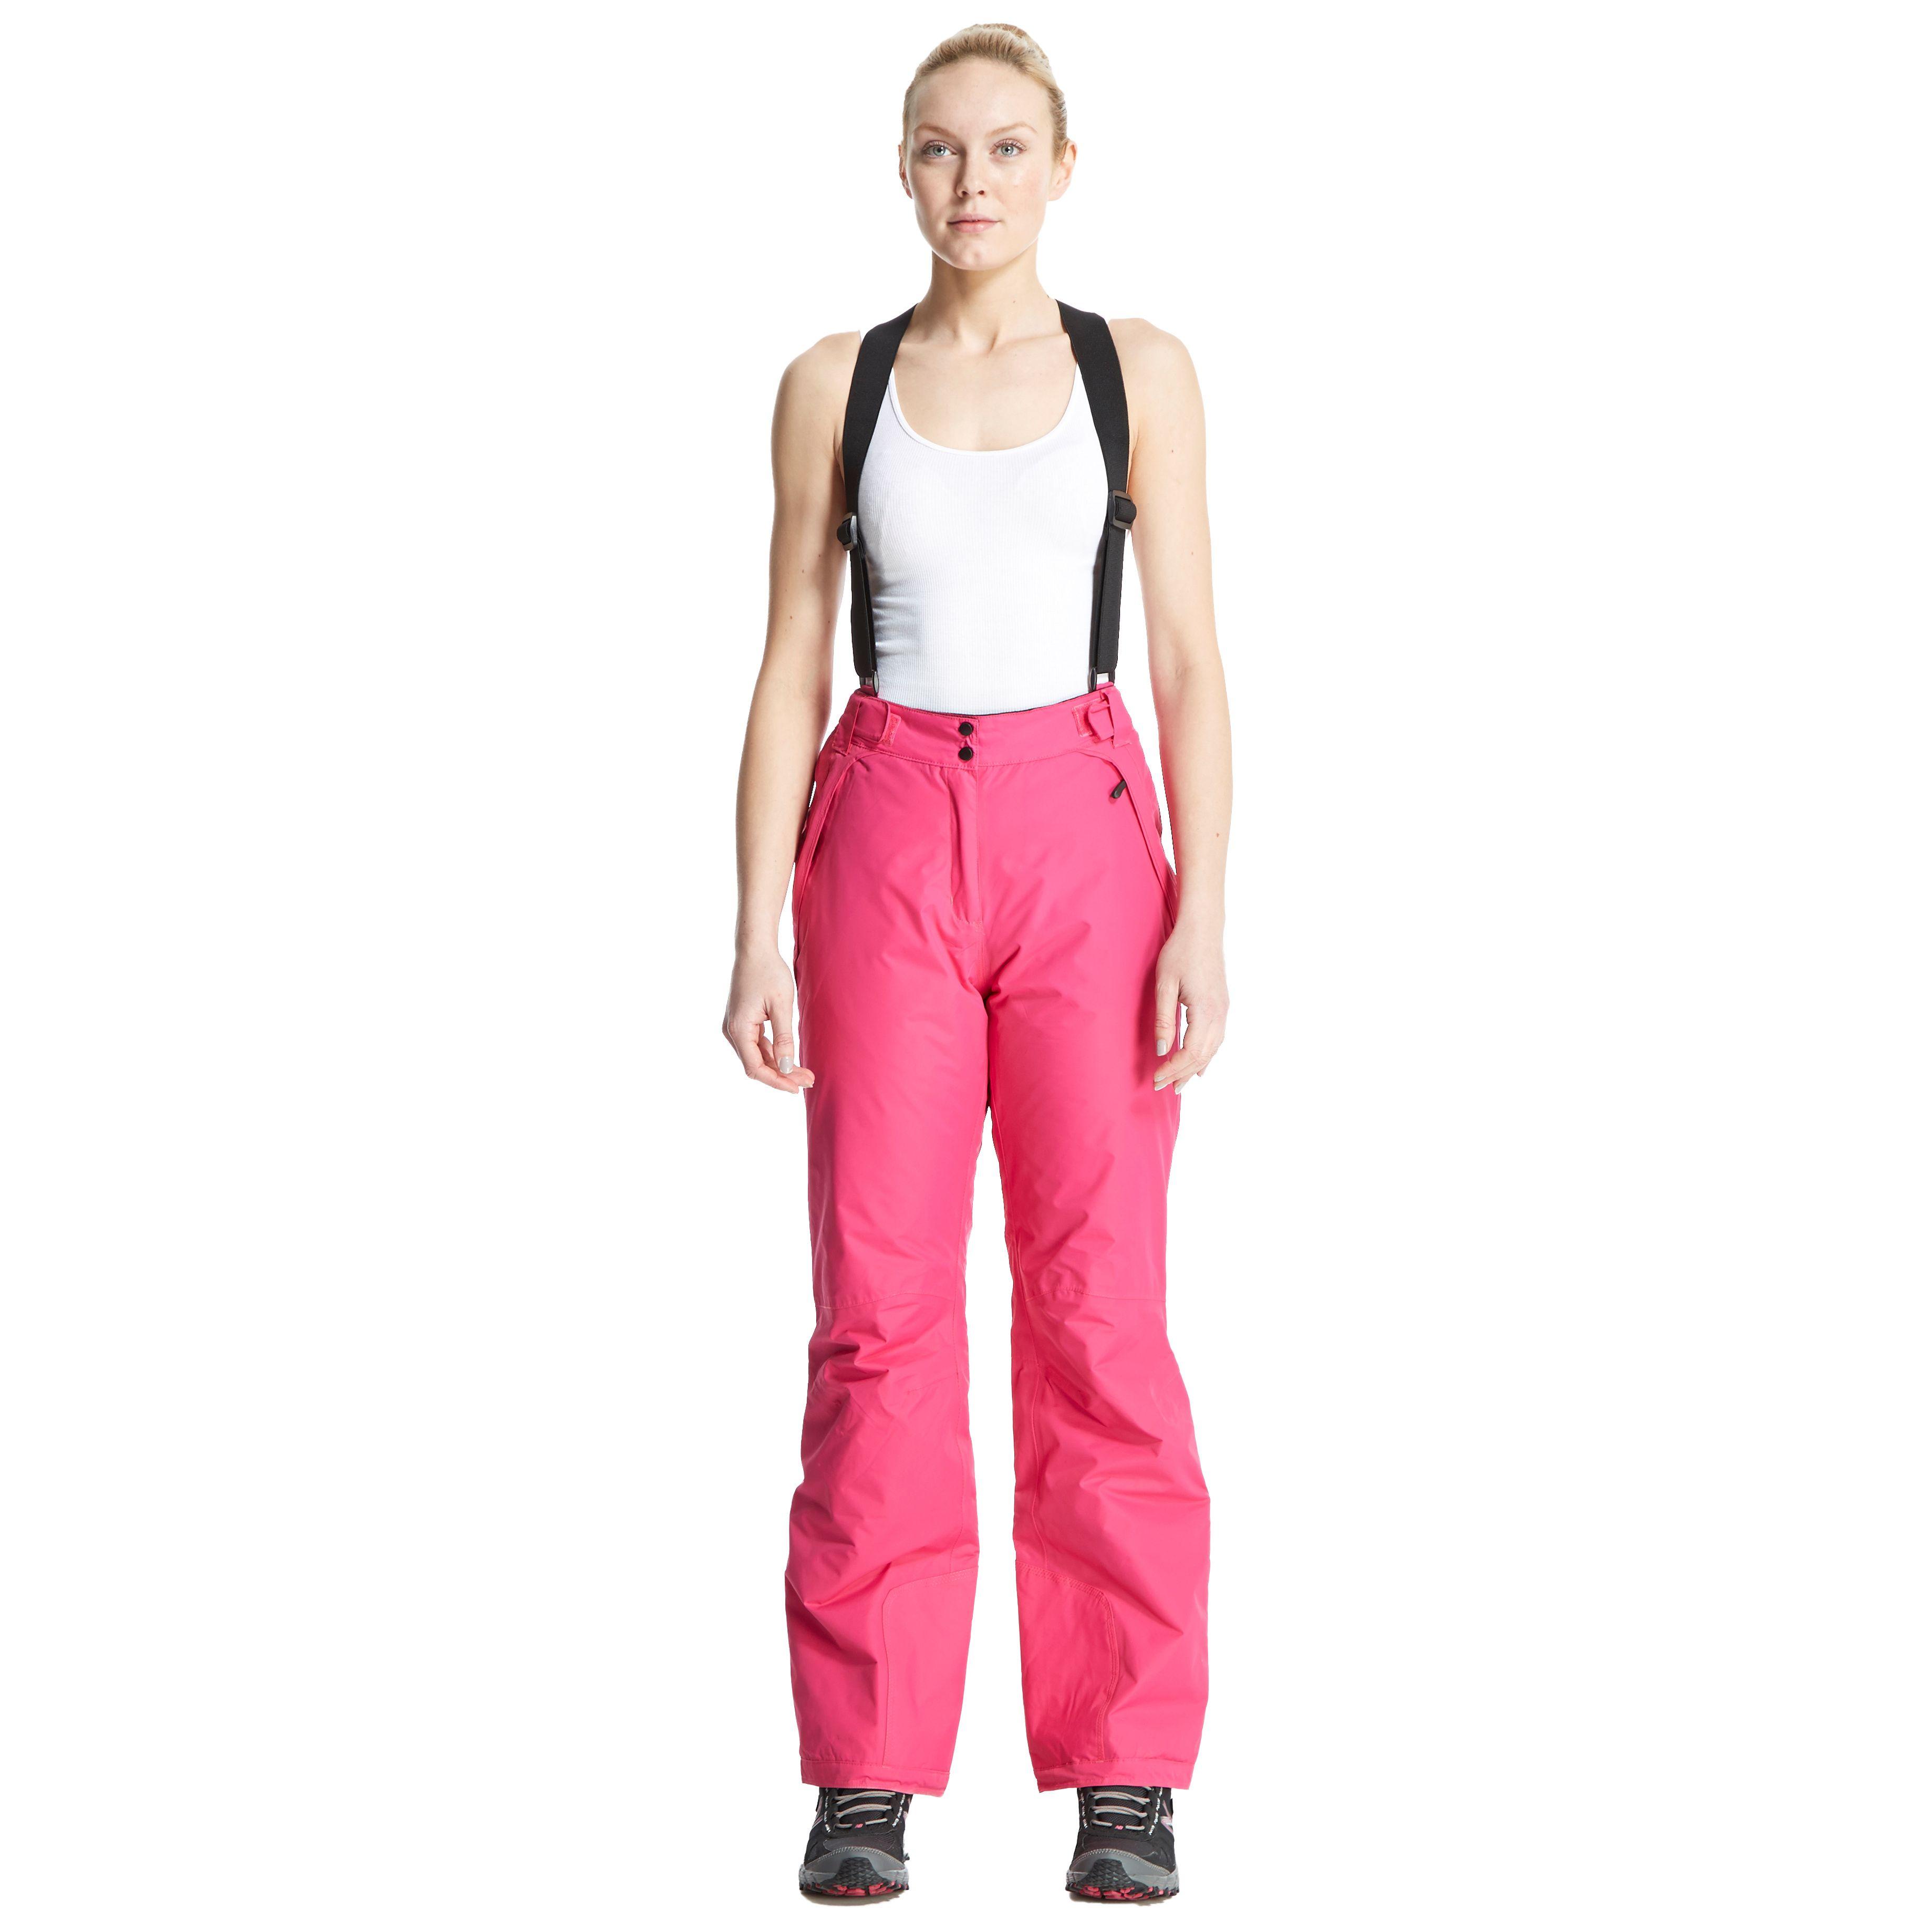 DARE 2B Women's Headturn Ski Trousers